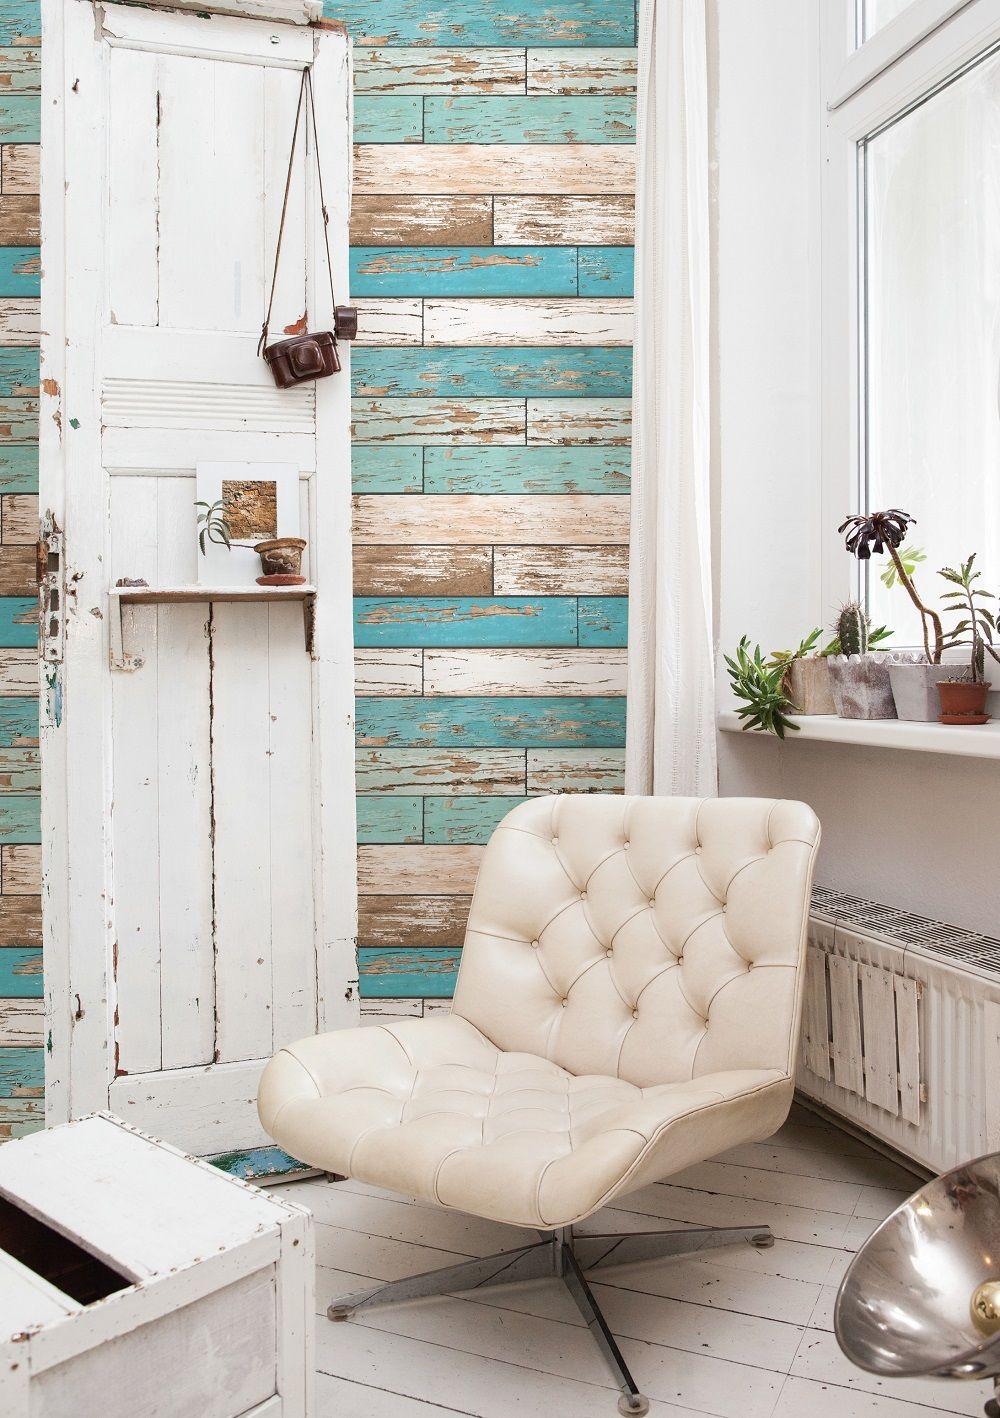 A Street Prints Scrap Wood Teal Wallpaper   Kitchen   Pinterest ...